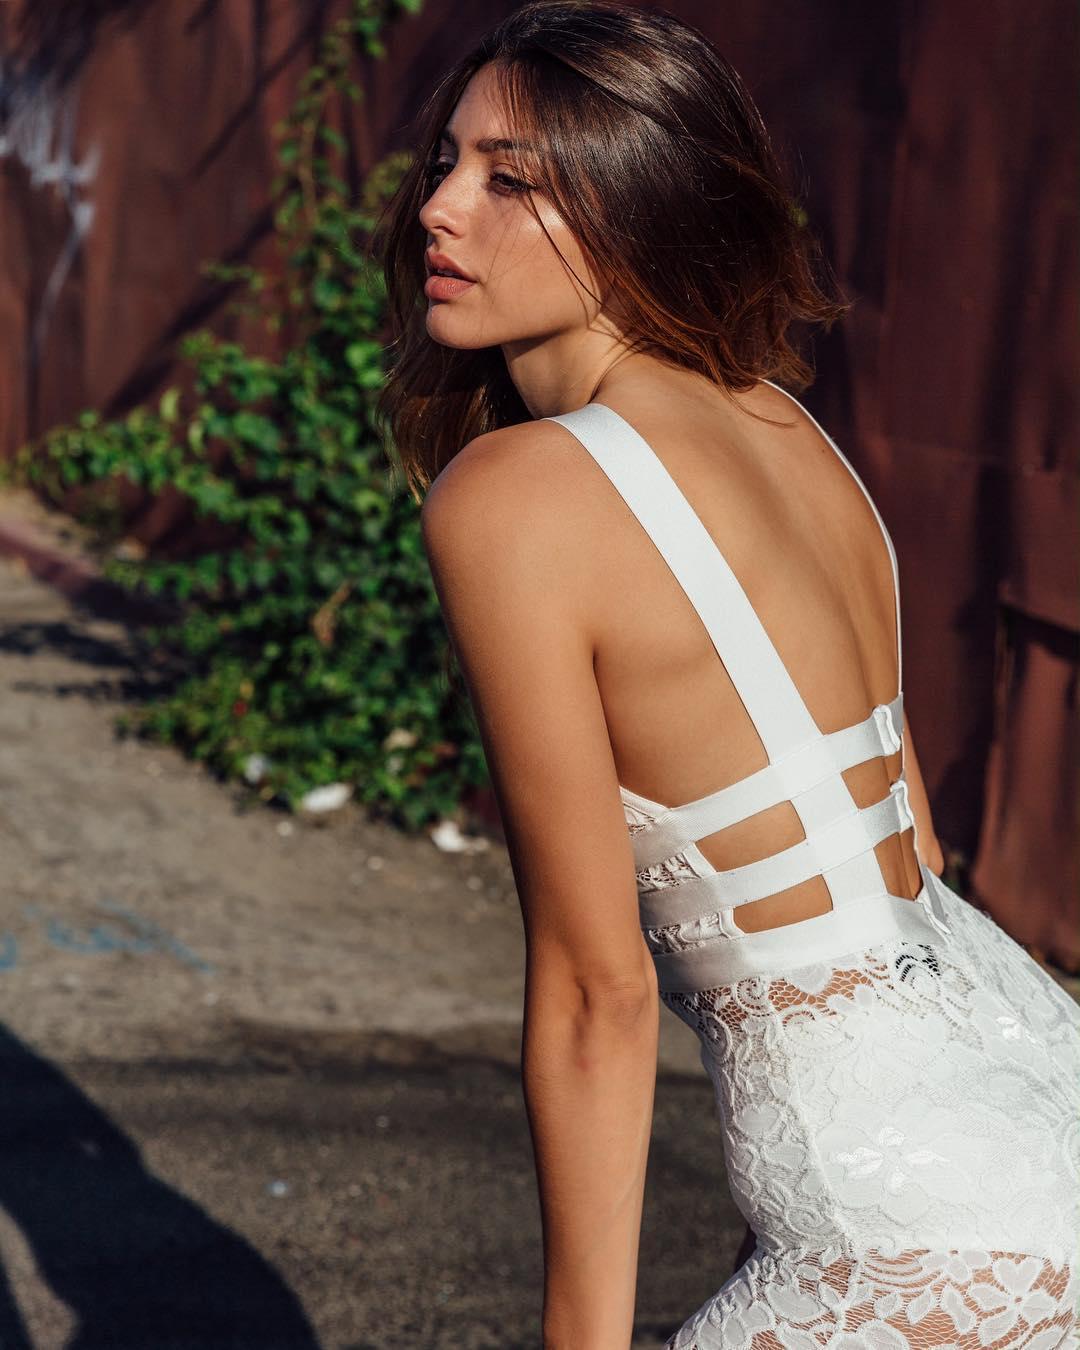 Too beautiful American model Celine Farrakhan028